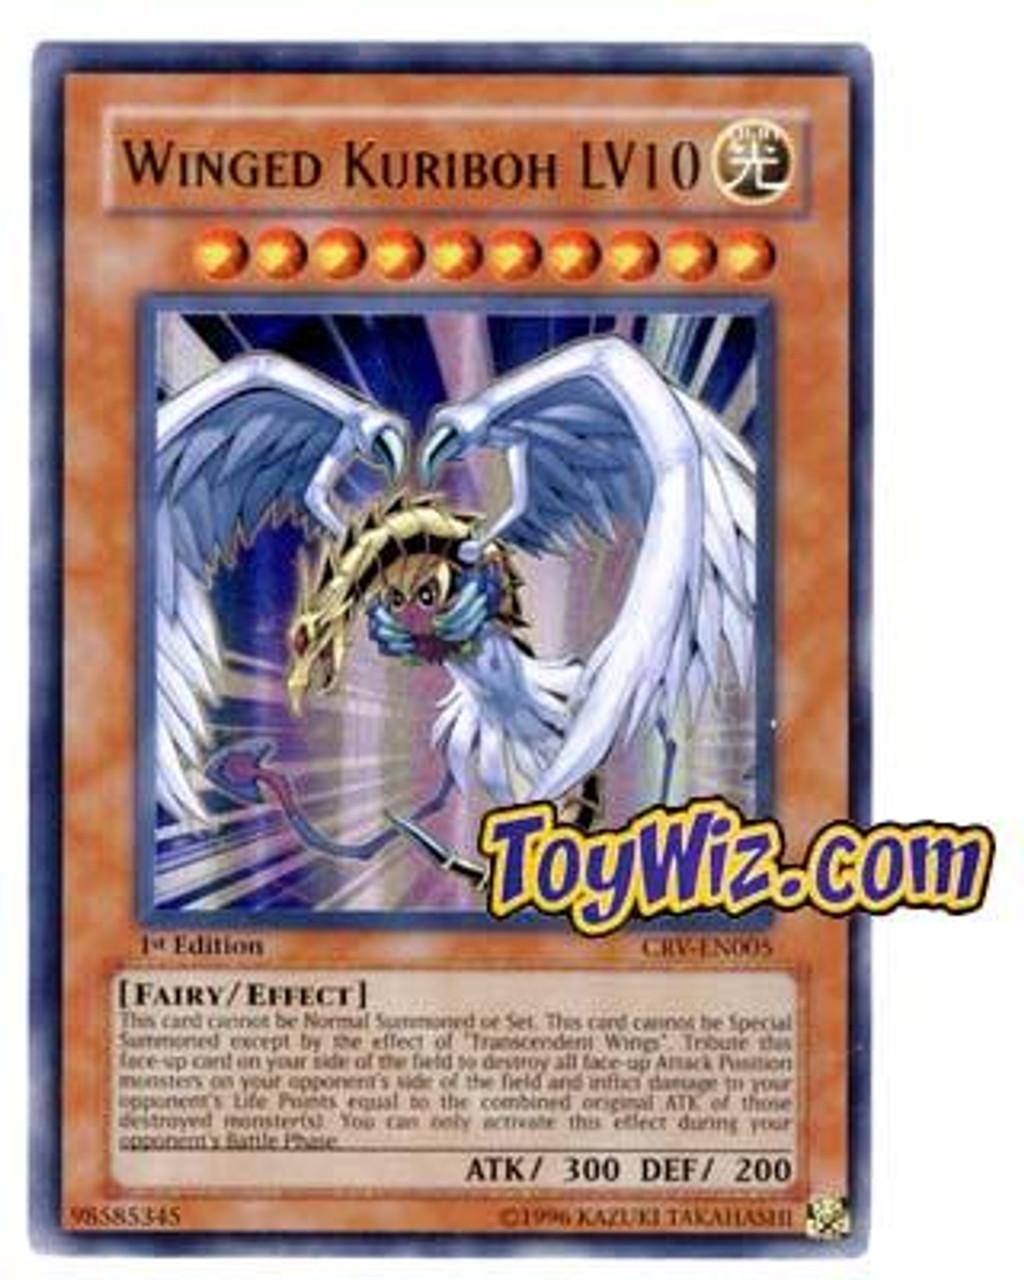 YuGiOh Cybernetic Revolution Ultra Rare Winged Kuriboh LV10 CRV-EN005